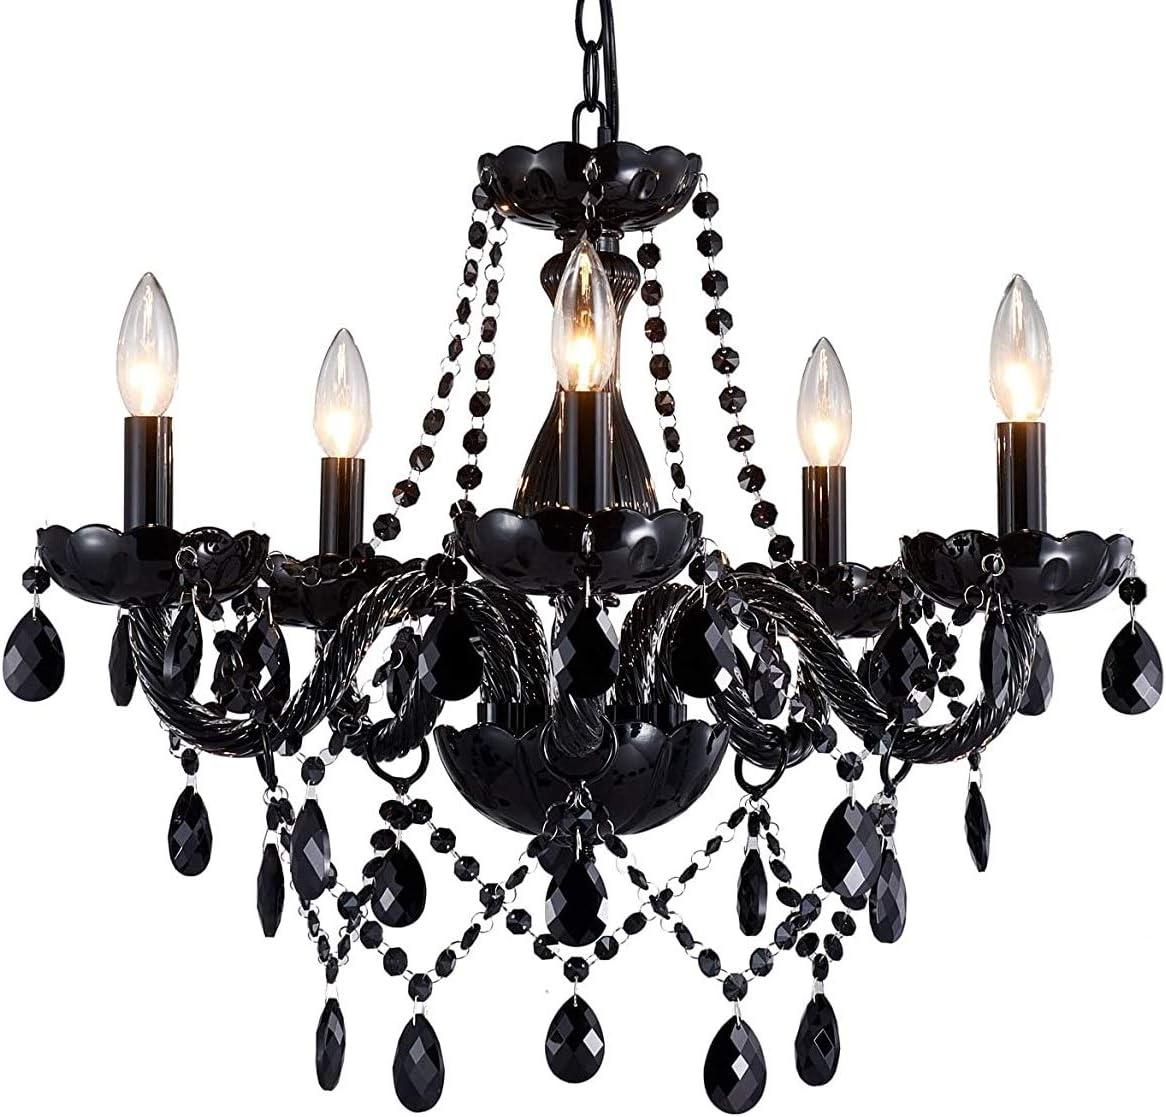 Saint Mossi Modern Contemporary Elegant K9 Crystal Glass Chandelier Pendant Ceiling Lighting Fixture – 5 Lights, Black Painted